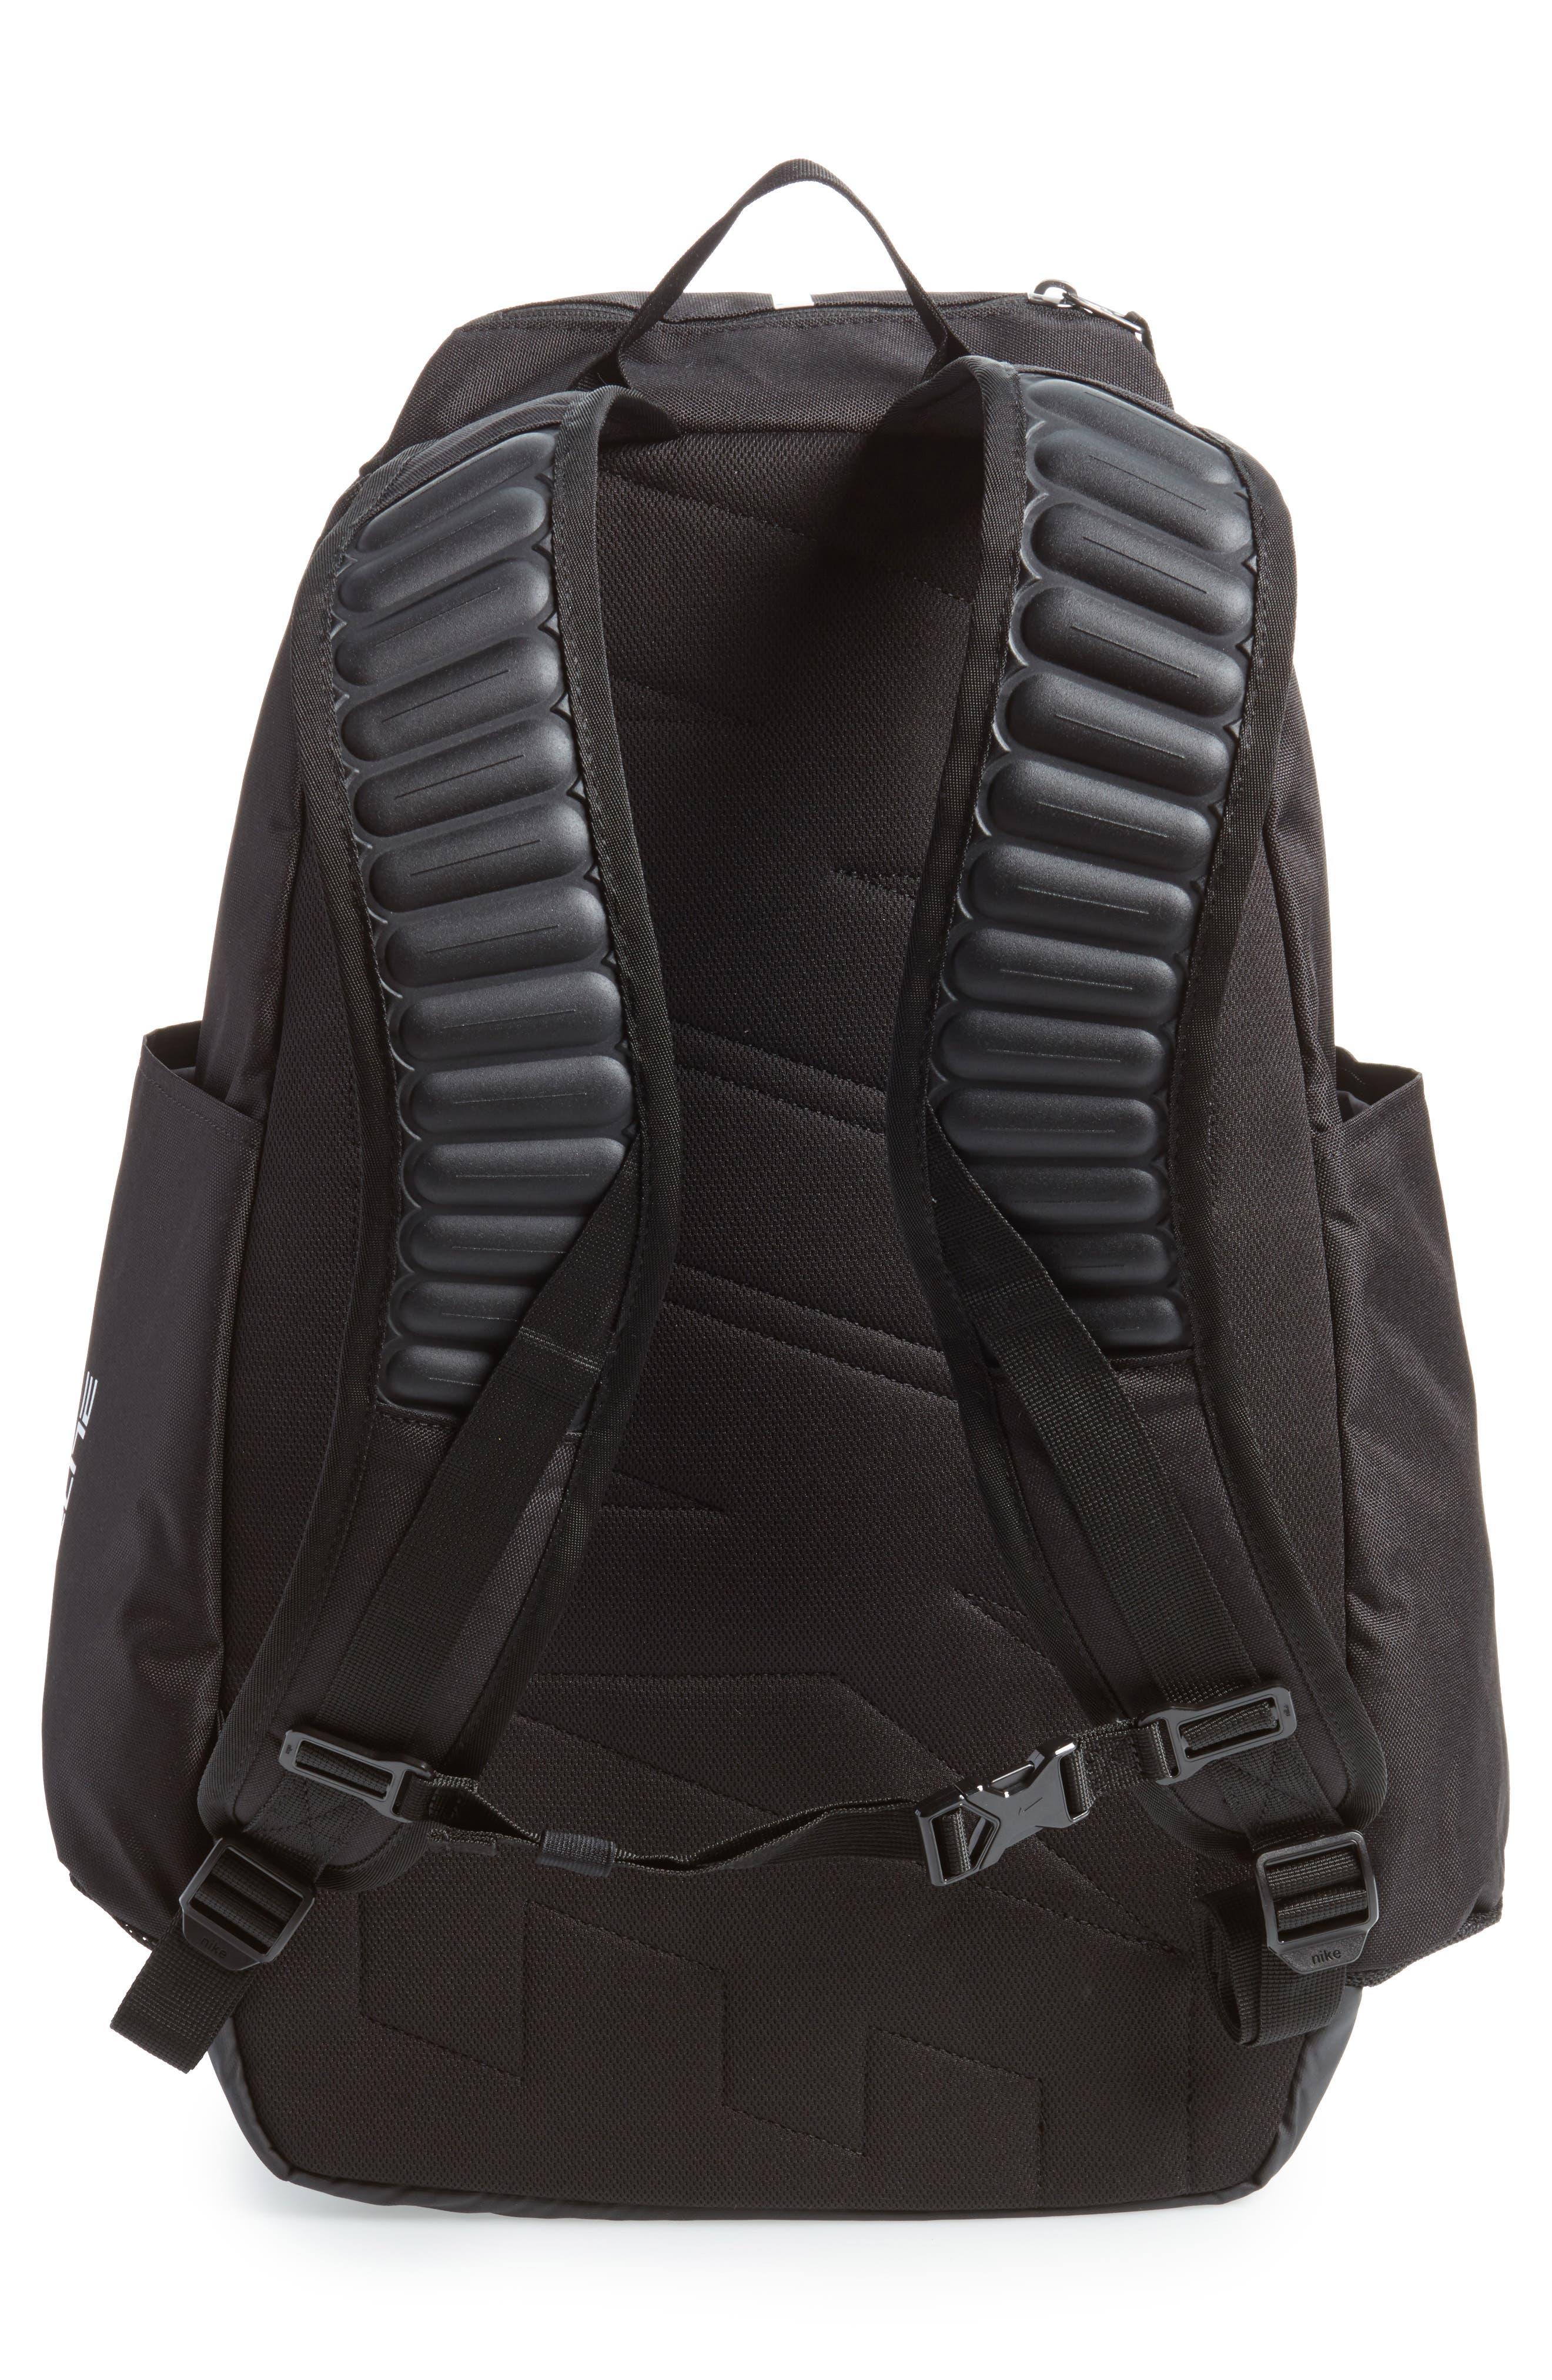 Hoops Elite Max Air Team Backpack,                             Alternate thumbnail 2, color,                             Black / White